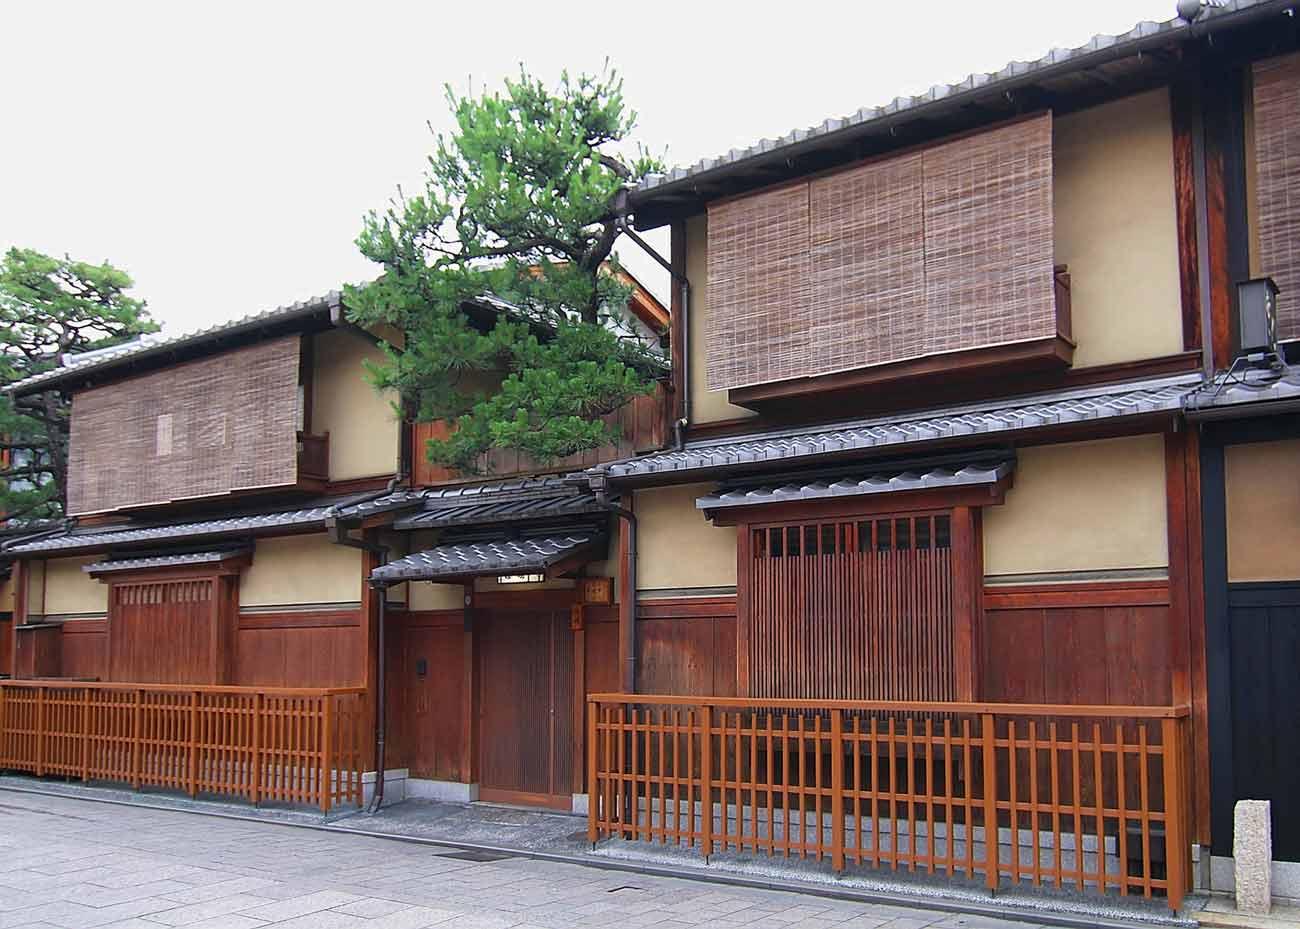 ©  Sodai Gomi  /  Creative Commons , Machiya in Gion